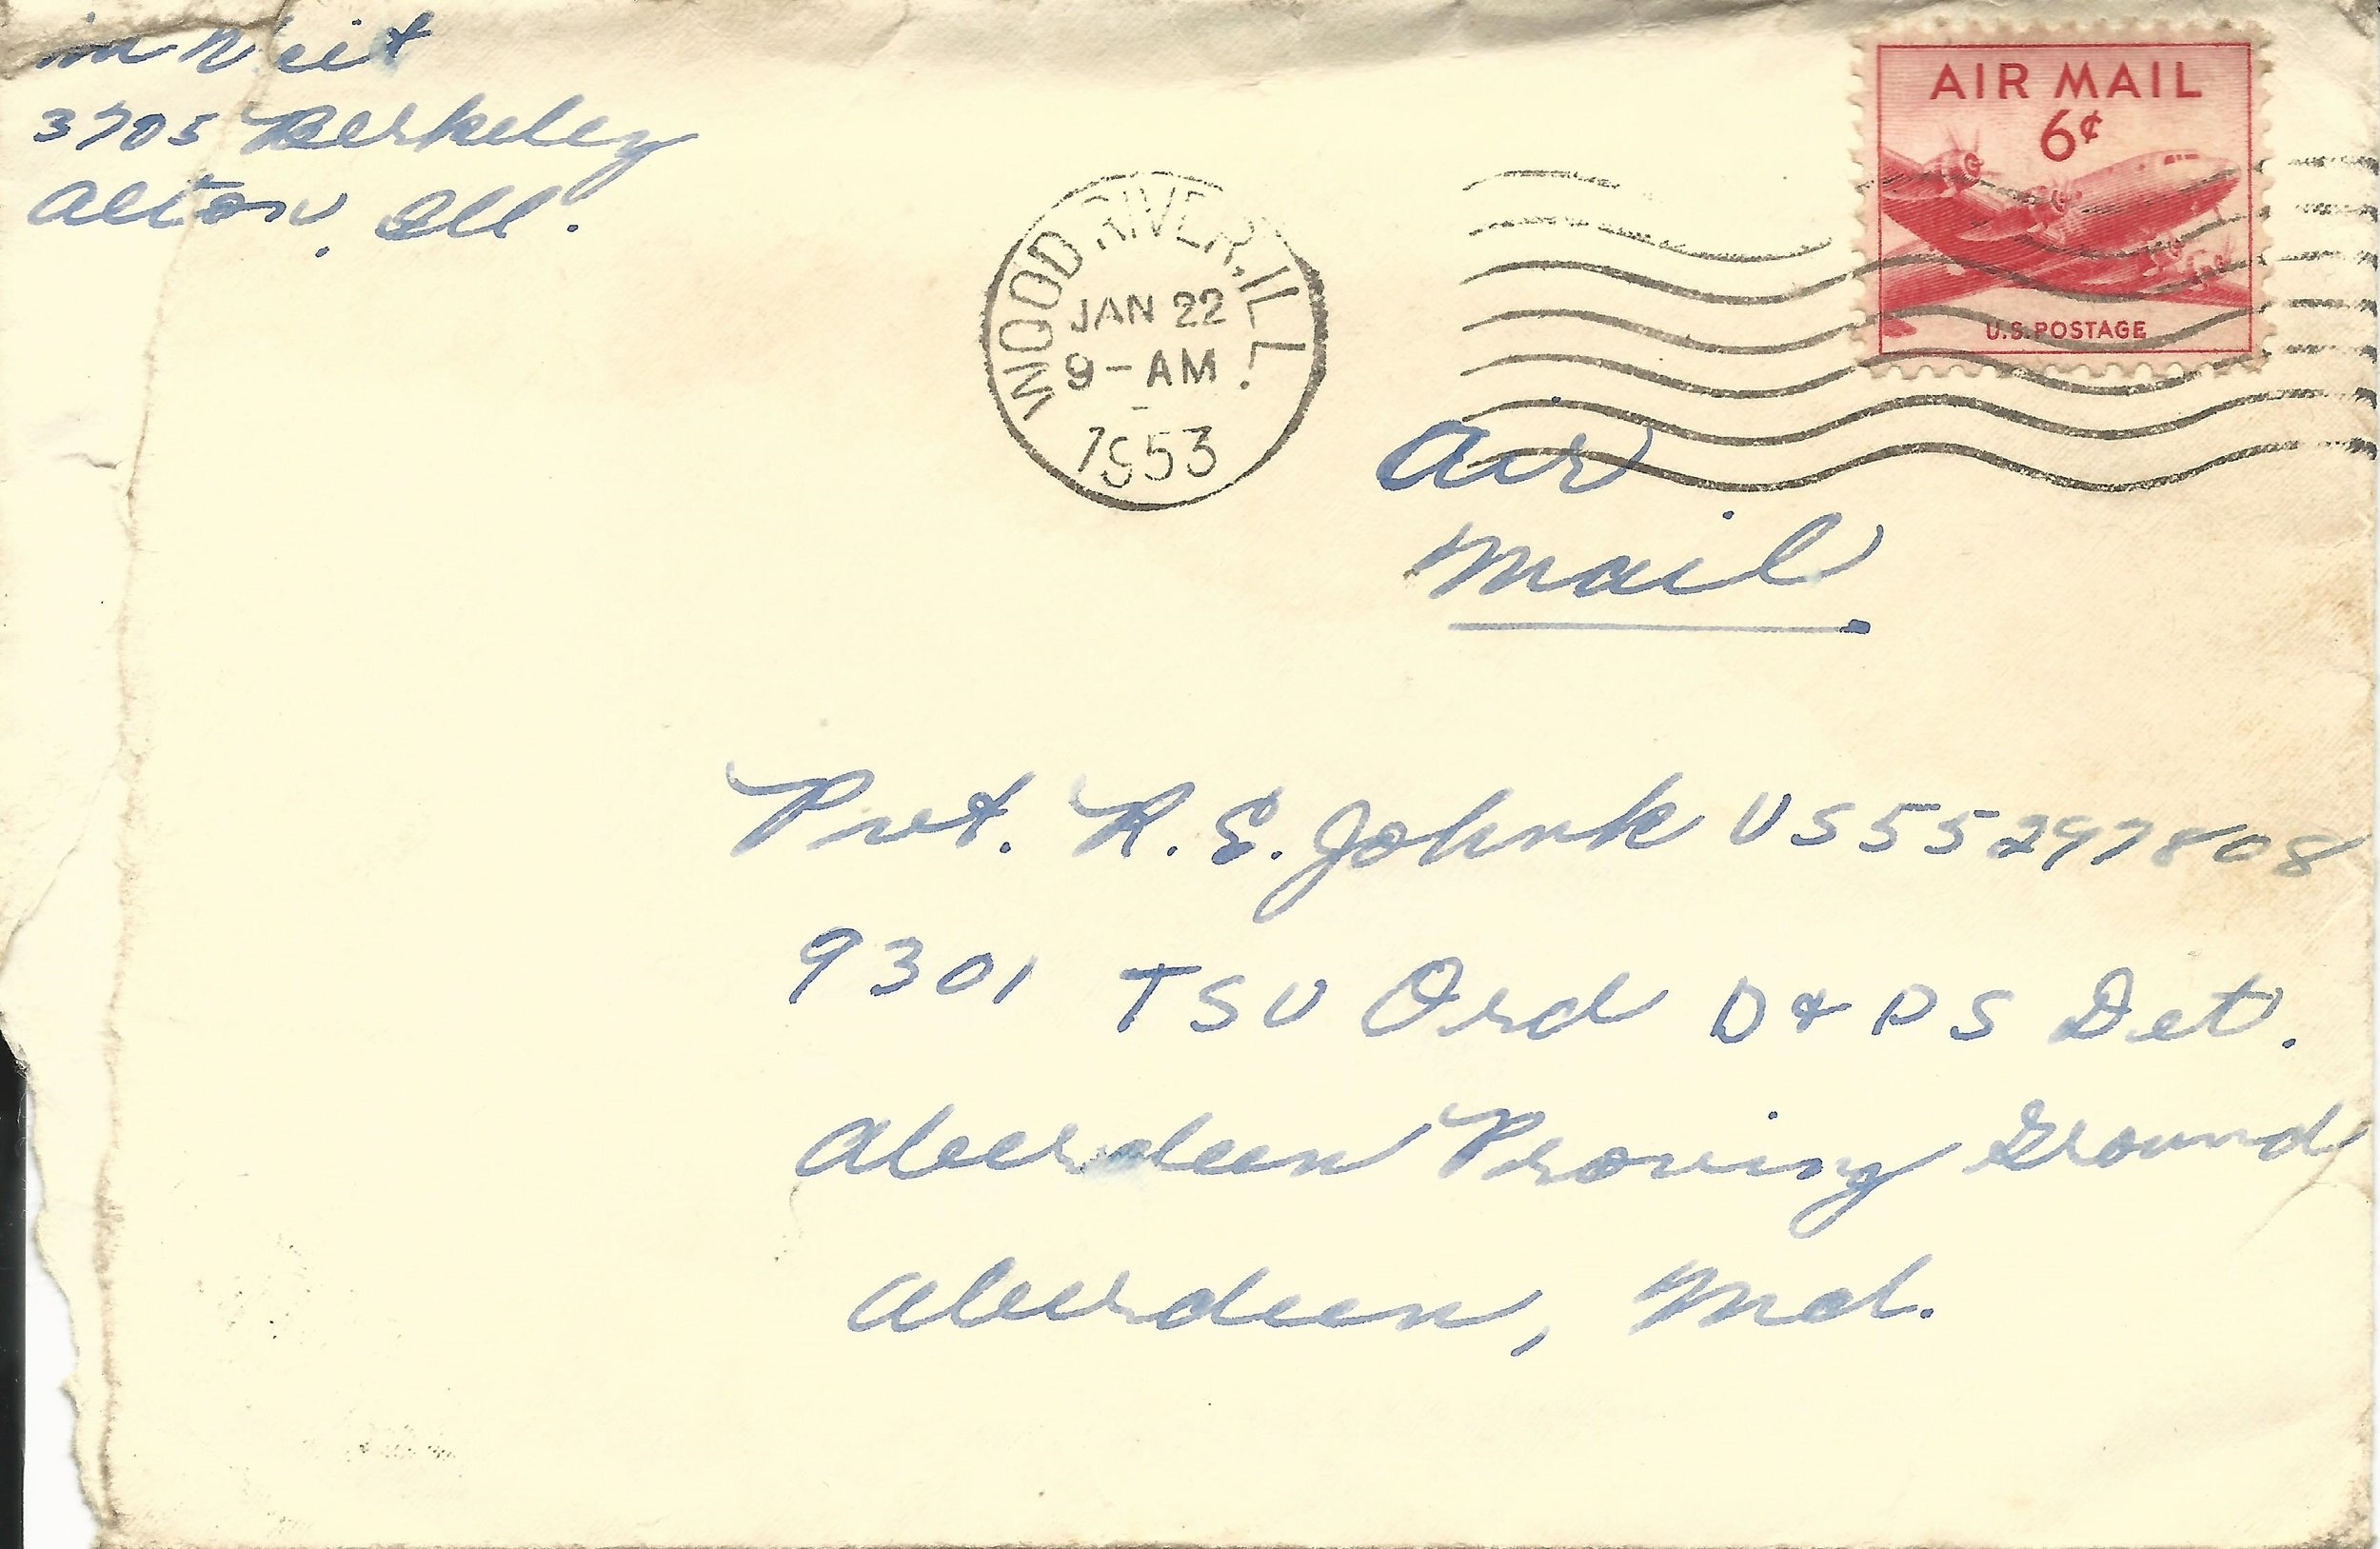 11. Jan. 21, 1953 (Oma)_Page_1.jpg